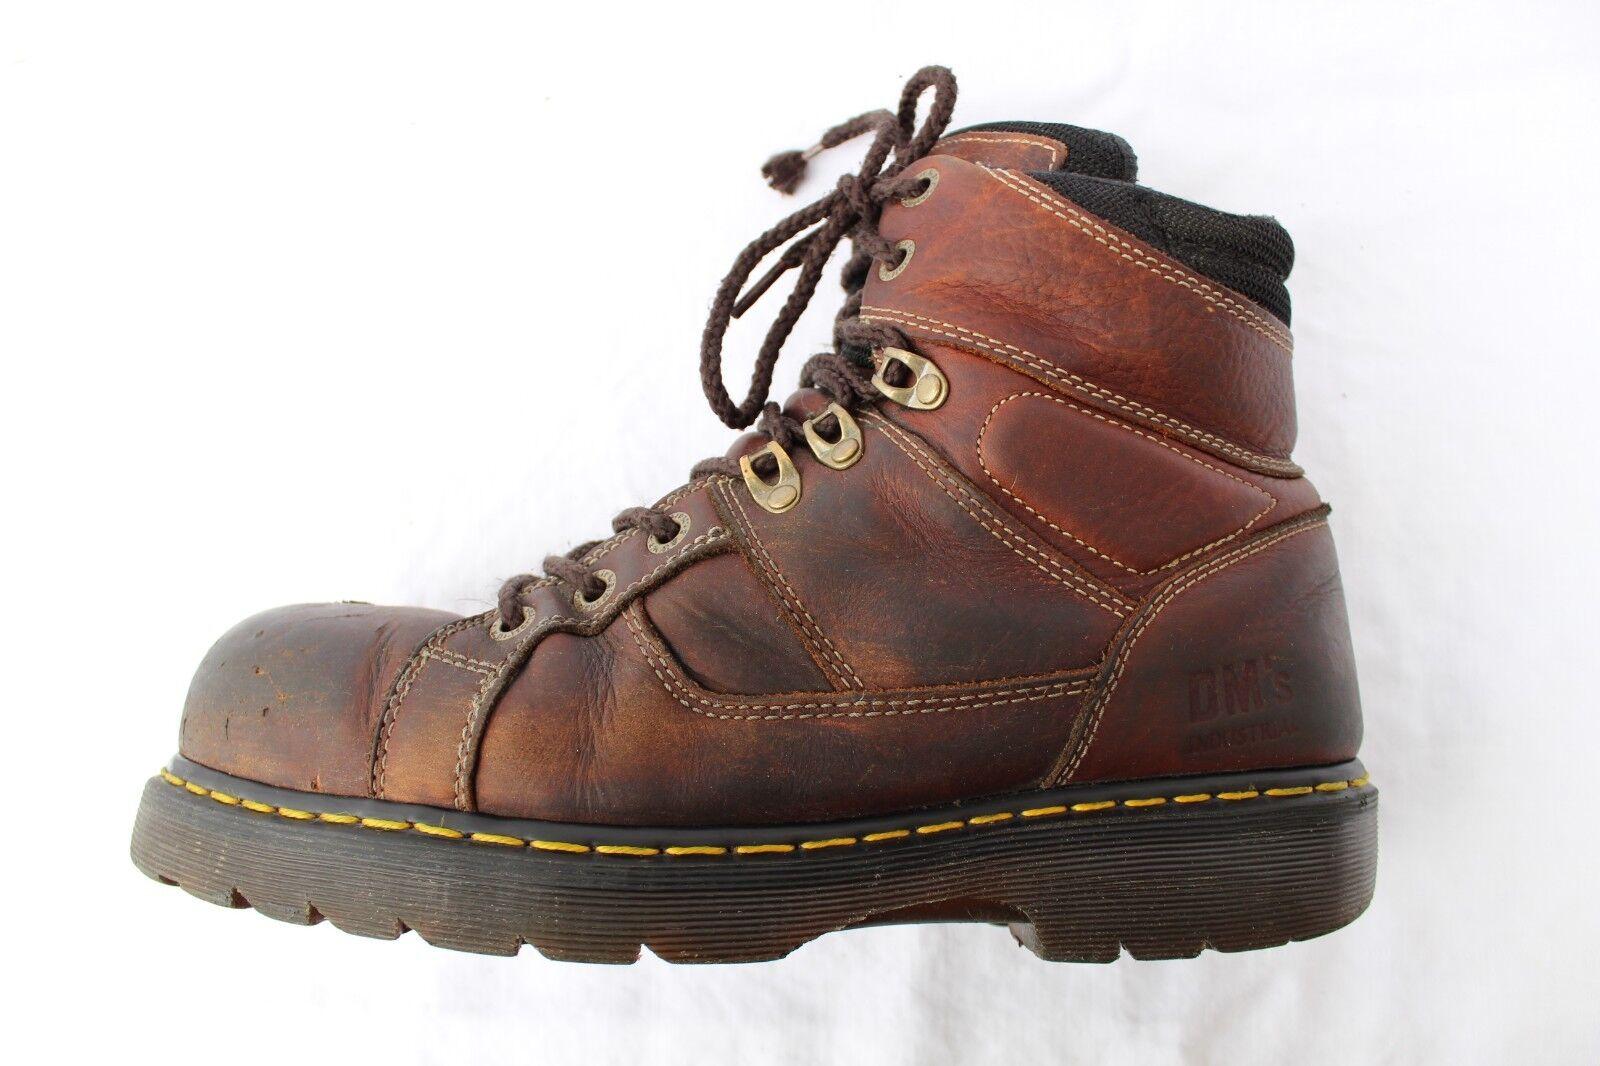 Dr Doc Martens D30 Steel Brown Toe Slip Resistant Brown Steel Pelle Uomo 11 M EUR 45 Stivali 6f5271